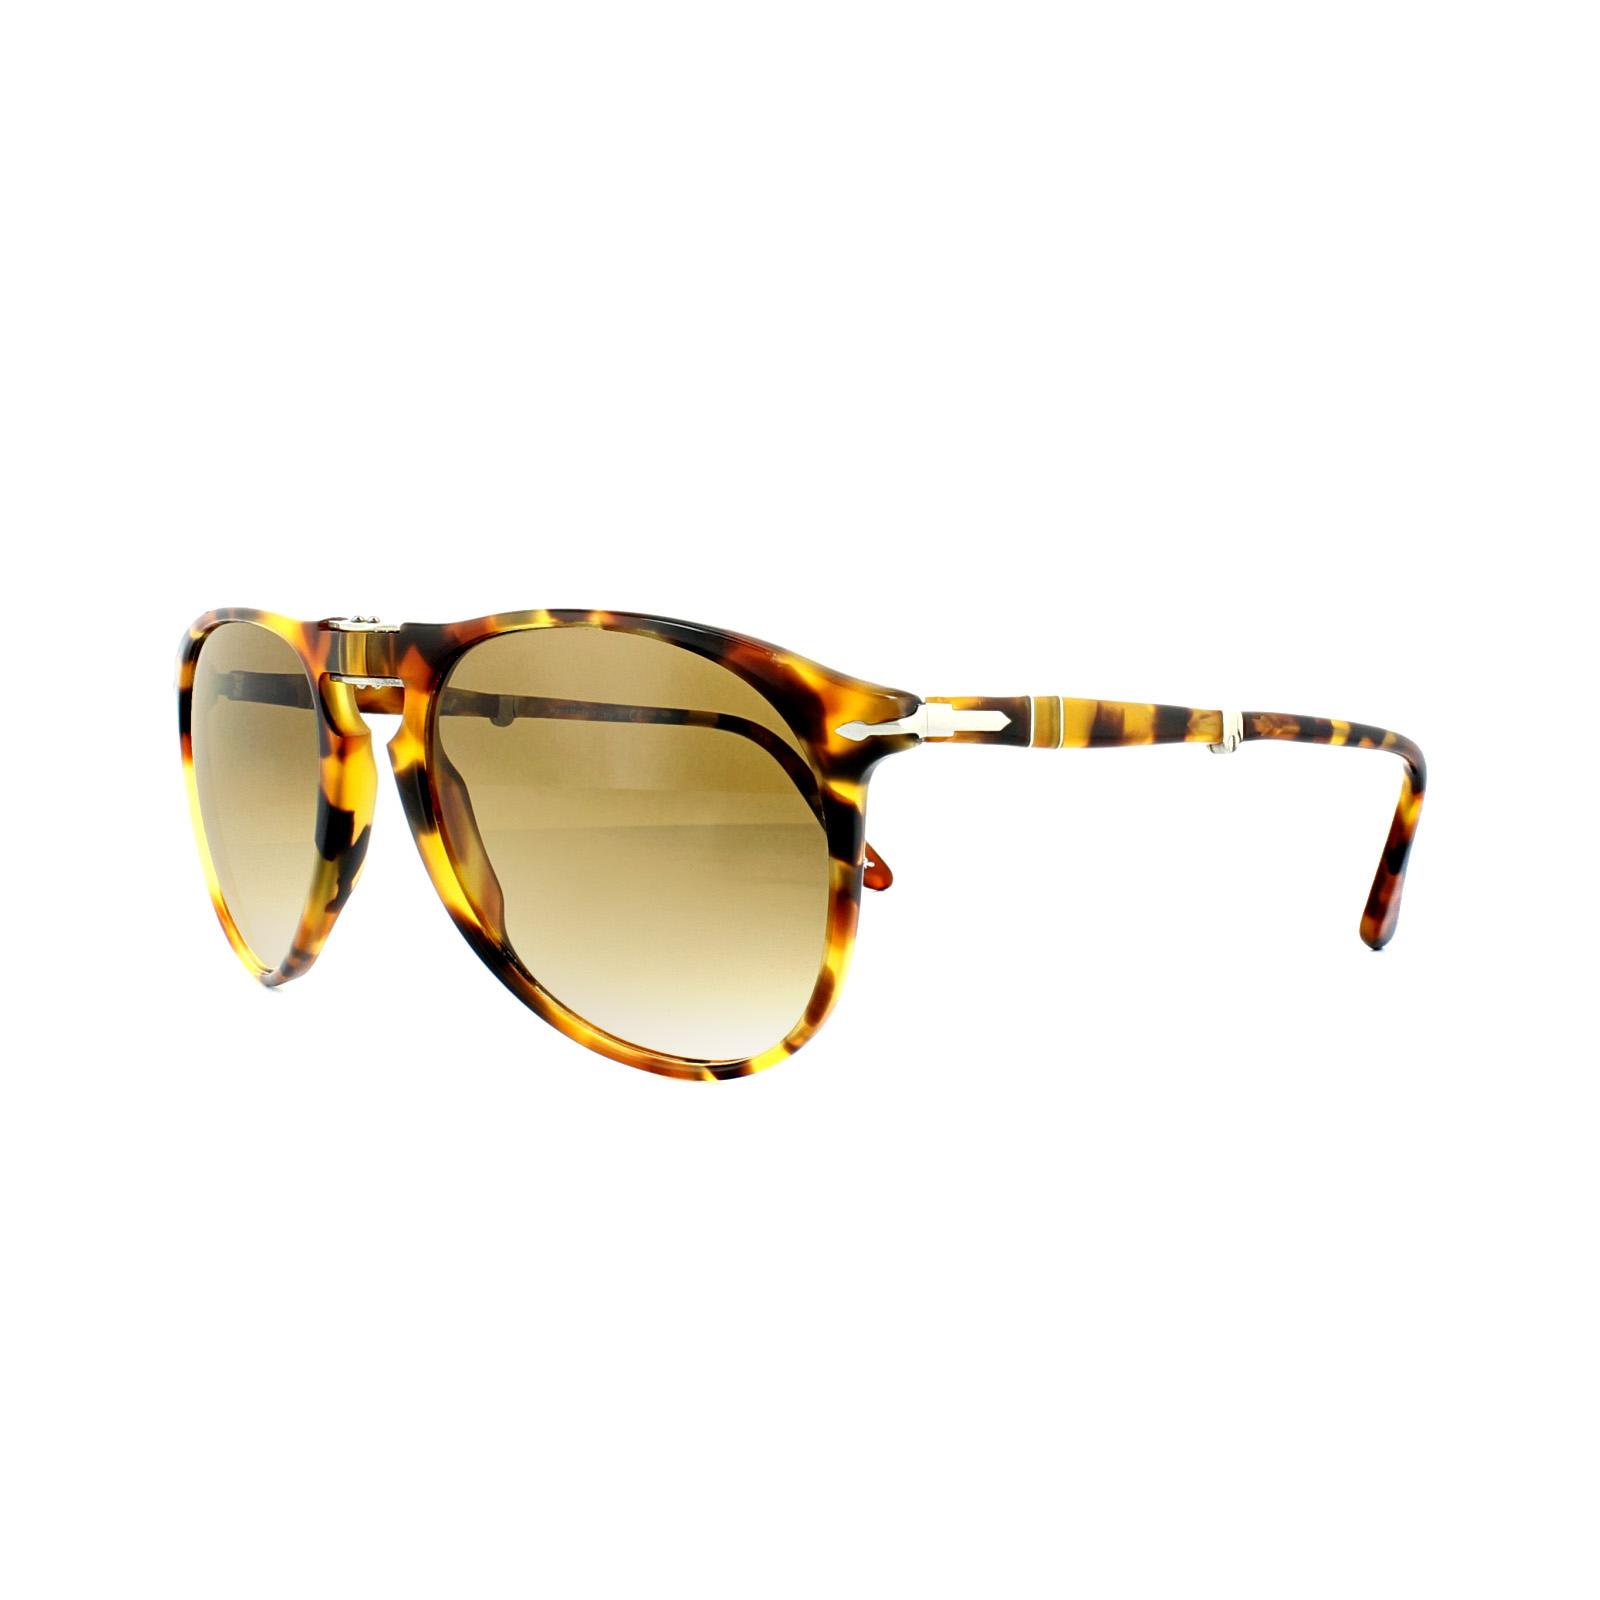 e148295594 Sentinel Persol Sunglasses 9714S 105251 Madreterra Brown Gradient. Sentinel  Thumbnail 2